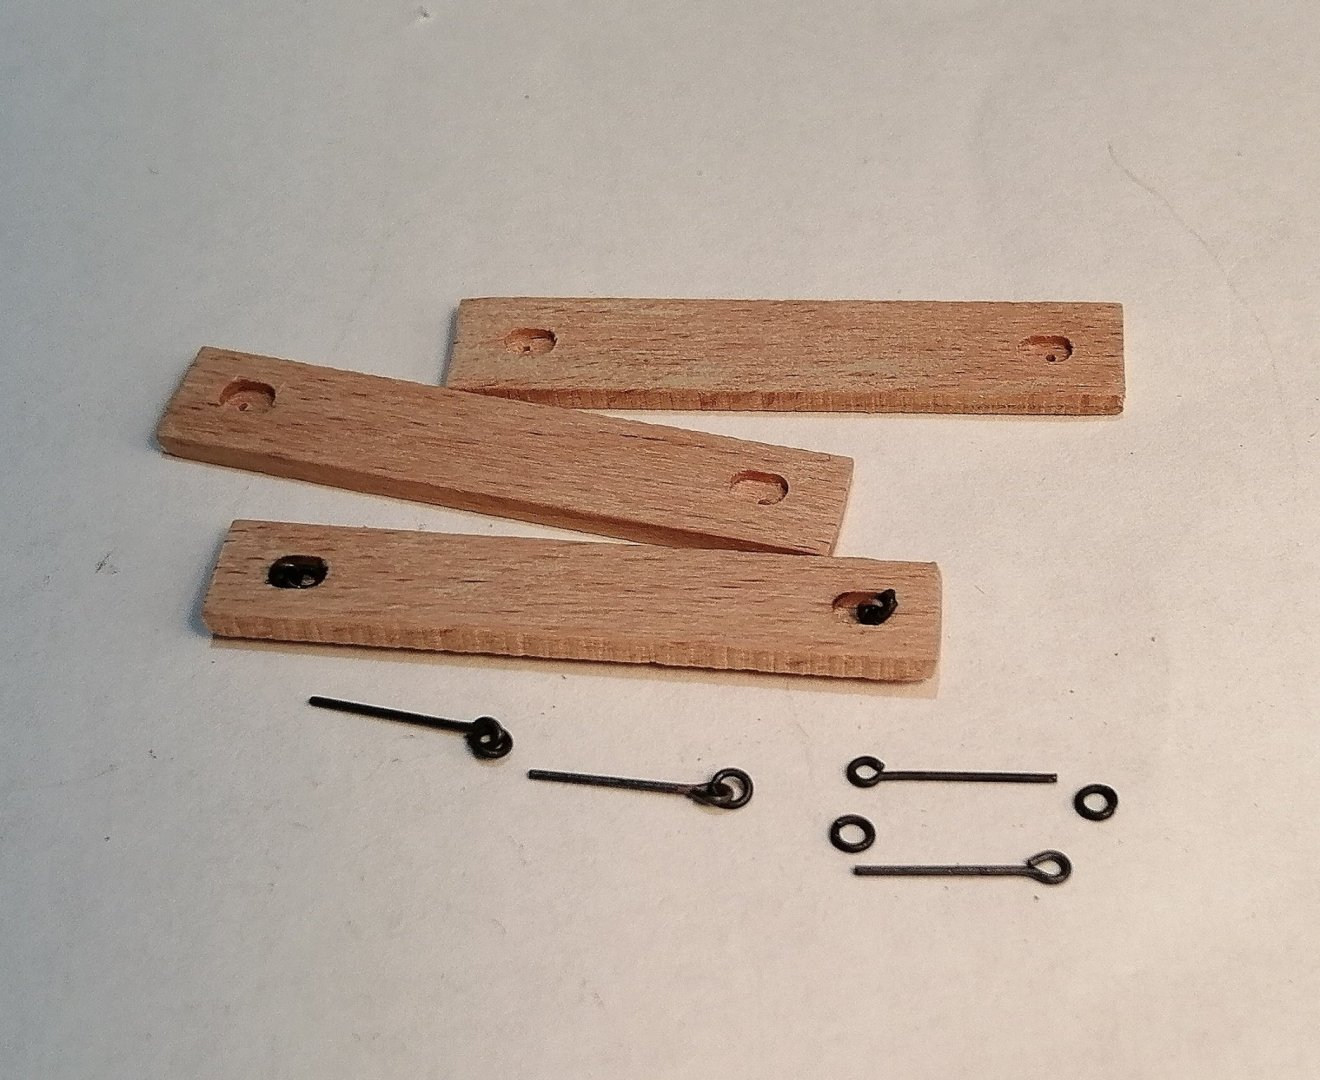 853360932_Planksliftrings.thumb.jpg.3ebc56446a6991e2a27cc599a384271f.jpg